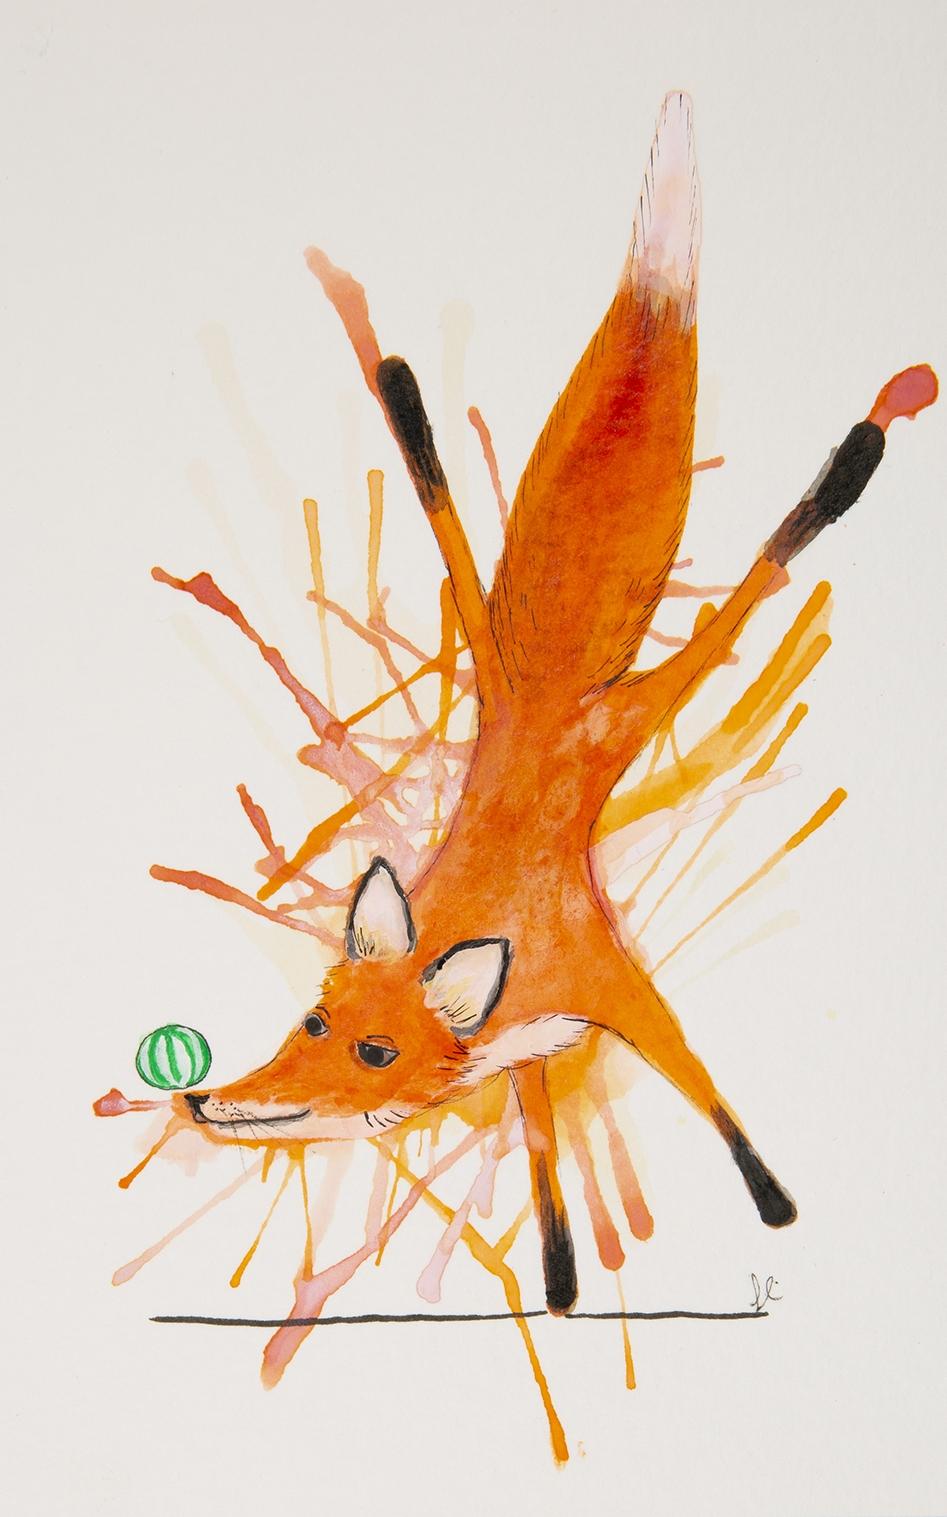 A Well Balanced Fox